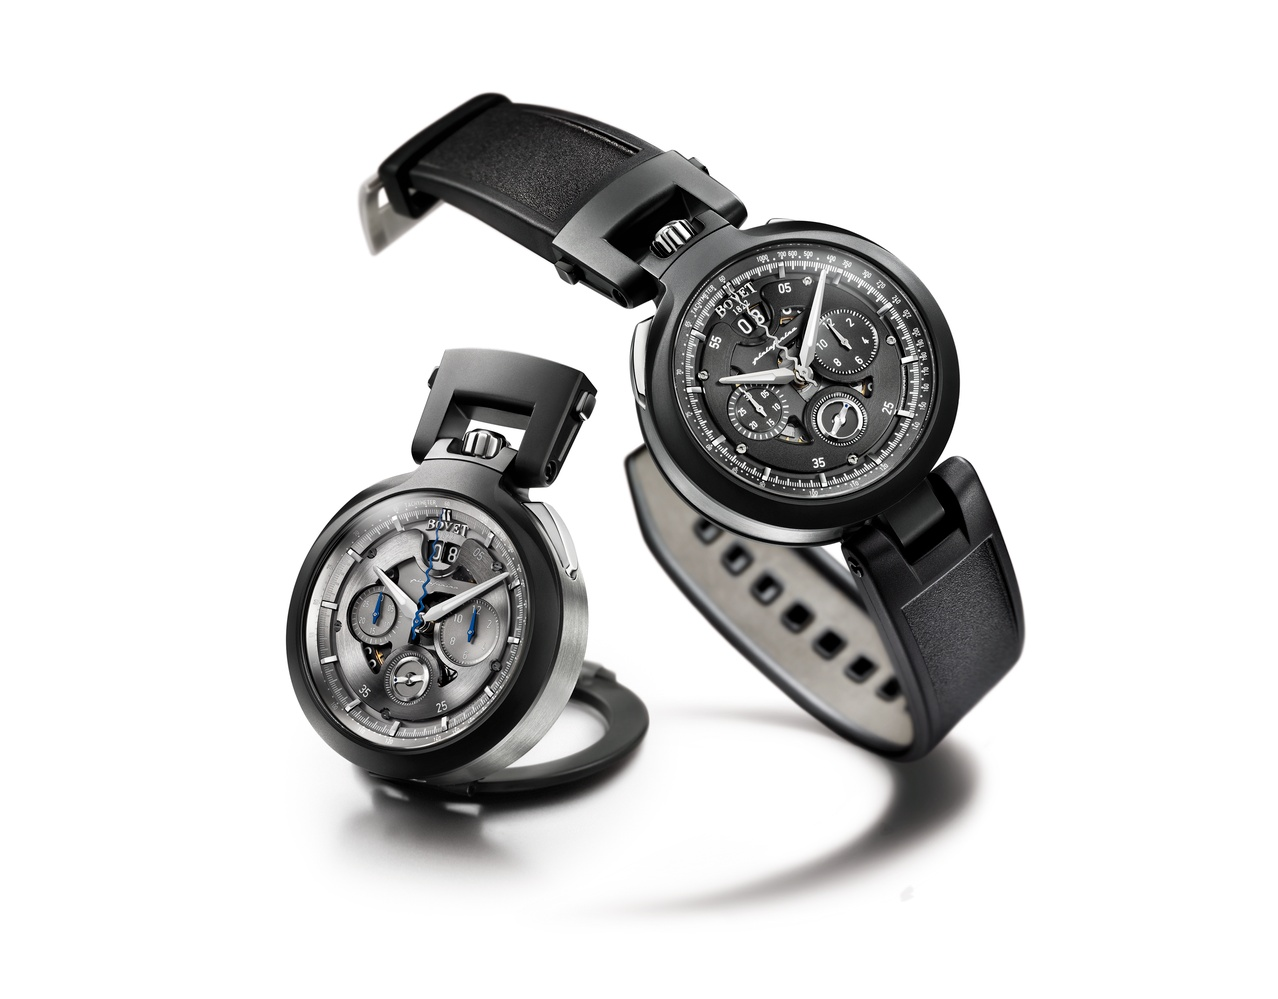 Bovet Watch   BOVET by Pininfarina   Ref. Nr.  CHPIN007    Call 312-944-3100  | For Availability